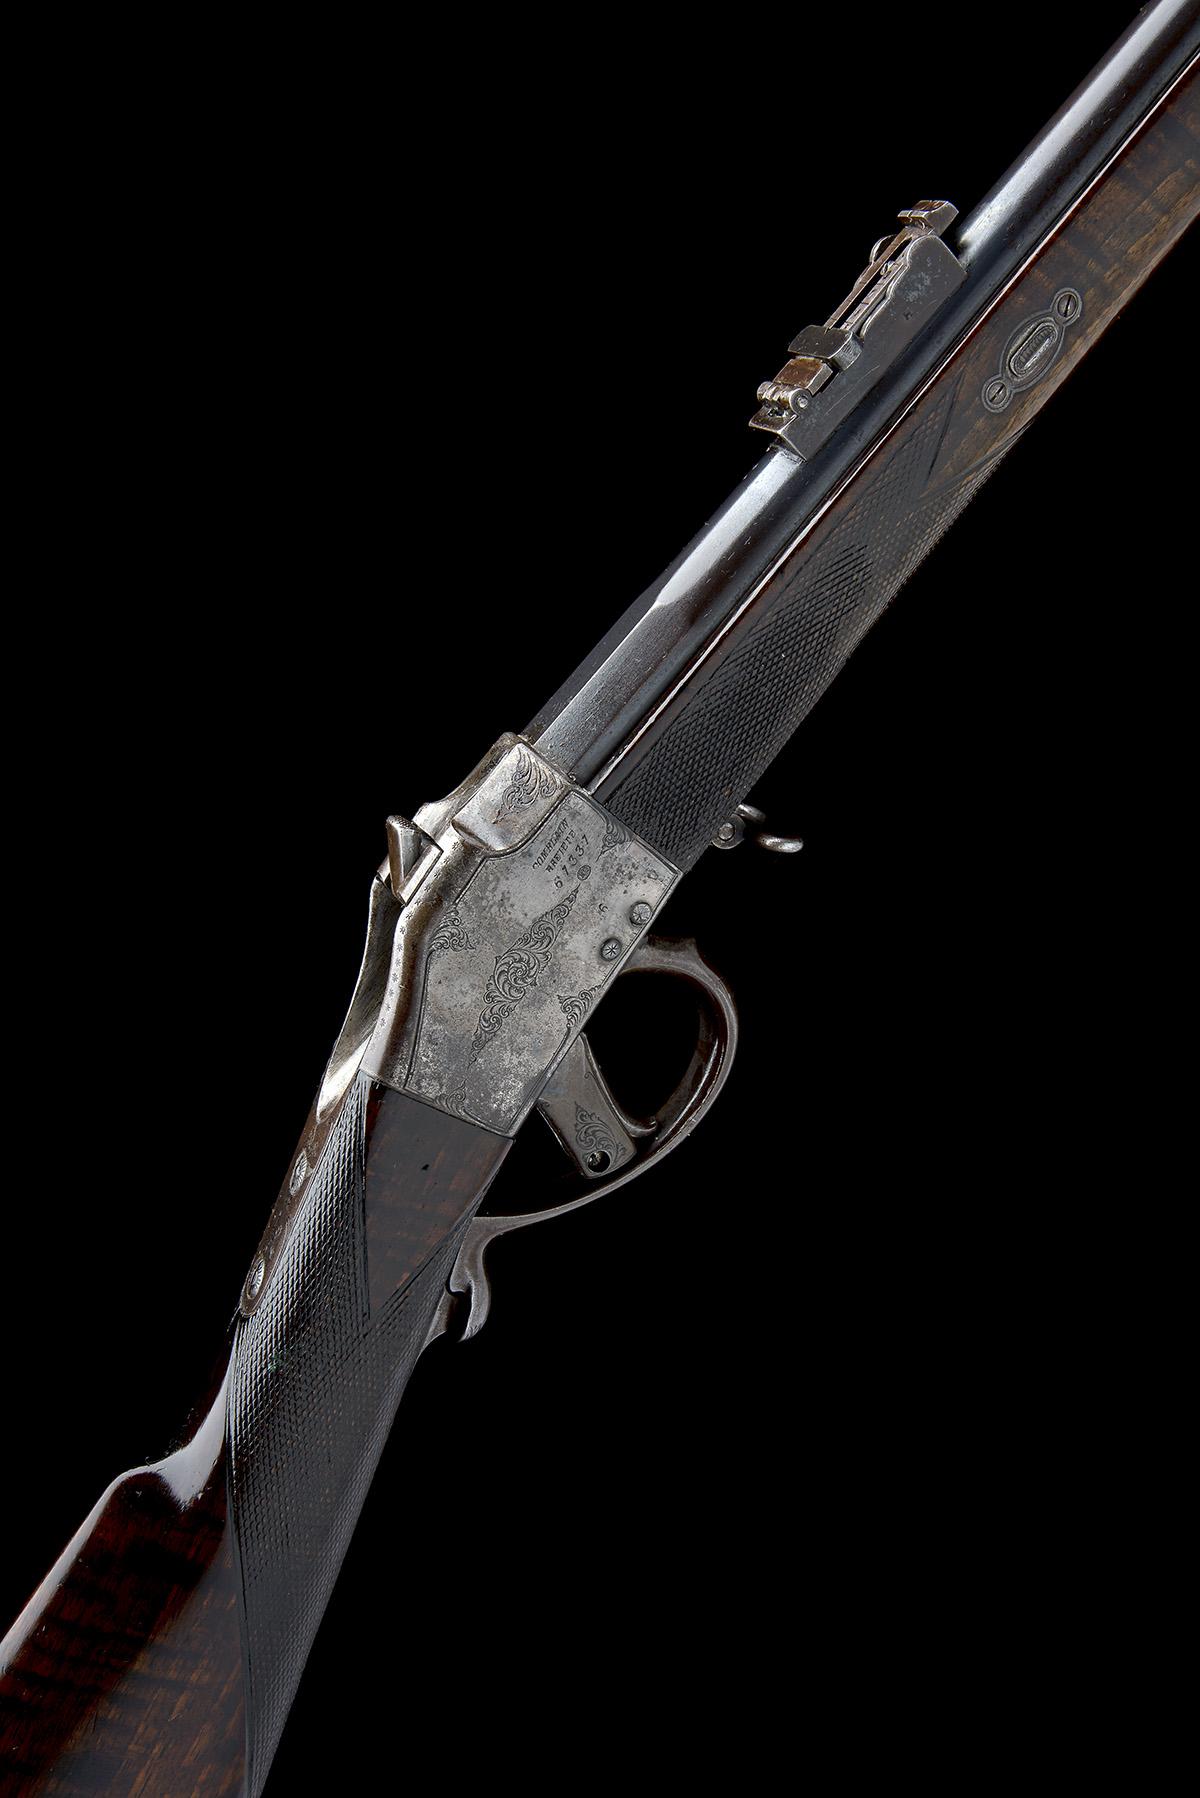 CHILEAN COMBLAIN AN 11x50R SINGLE-SHOT FALLING-BLOCK SPORTING-RIFLE, UNSIGNED, MODEL 'M84 COMBLAIN